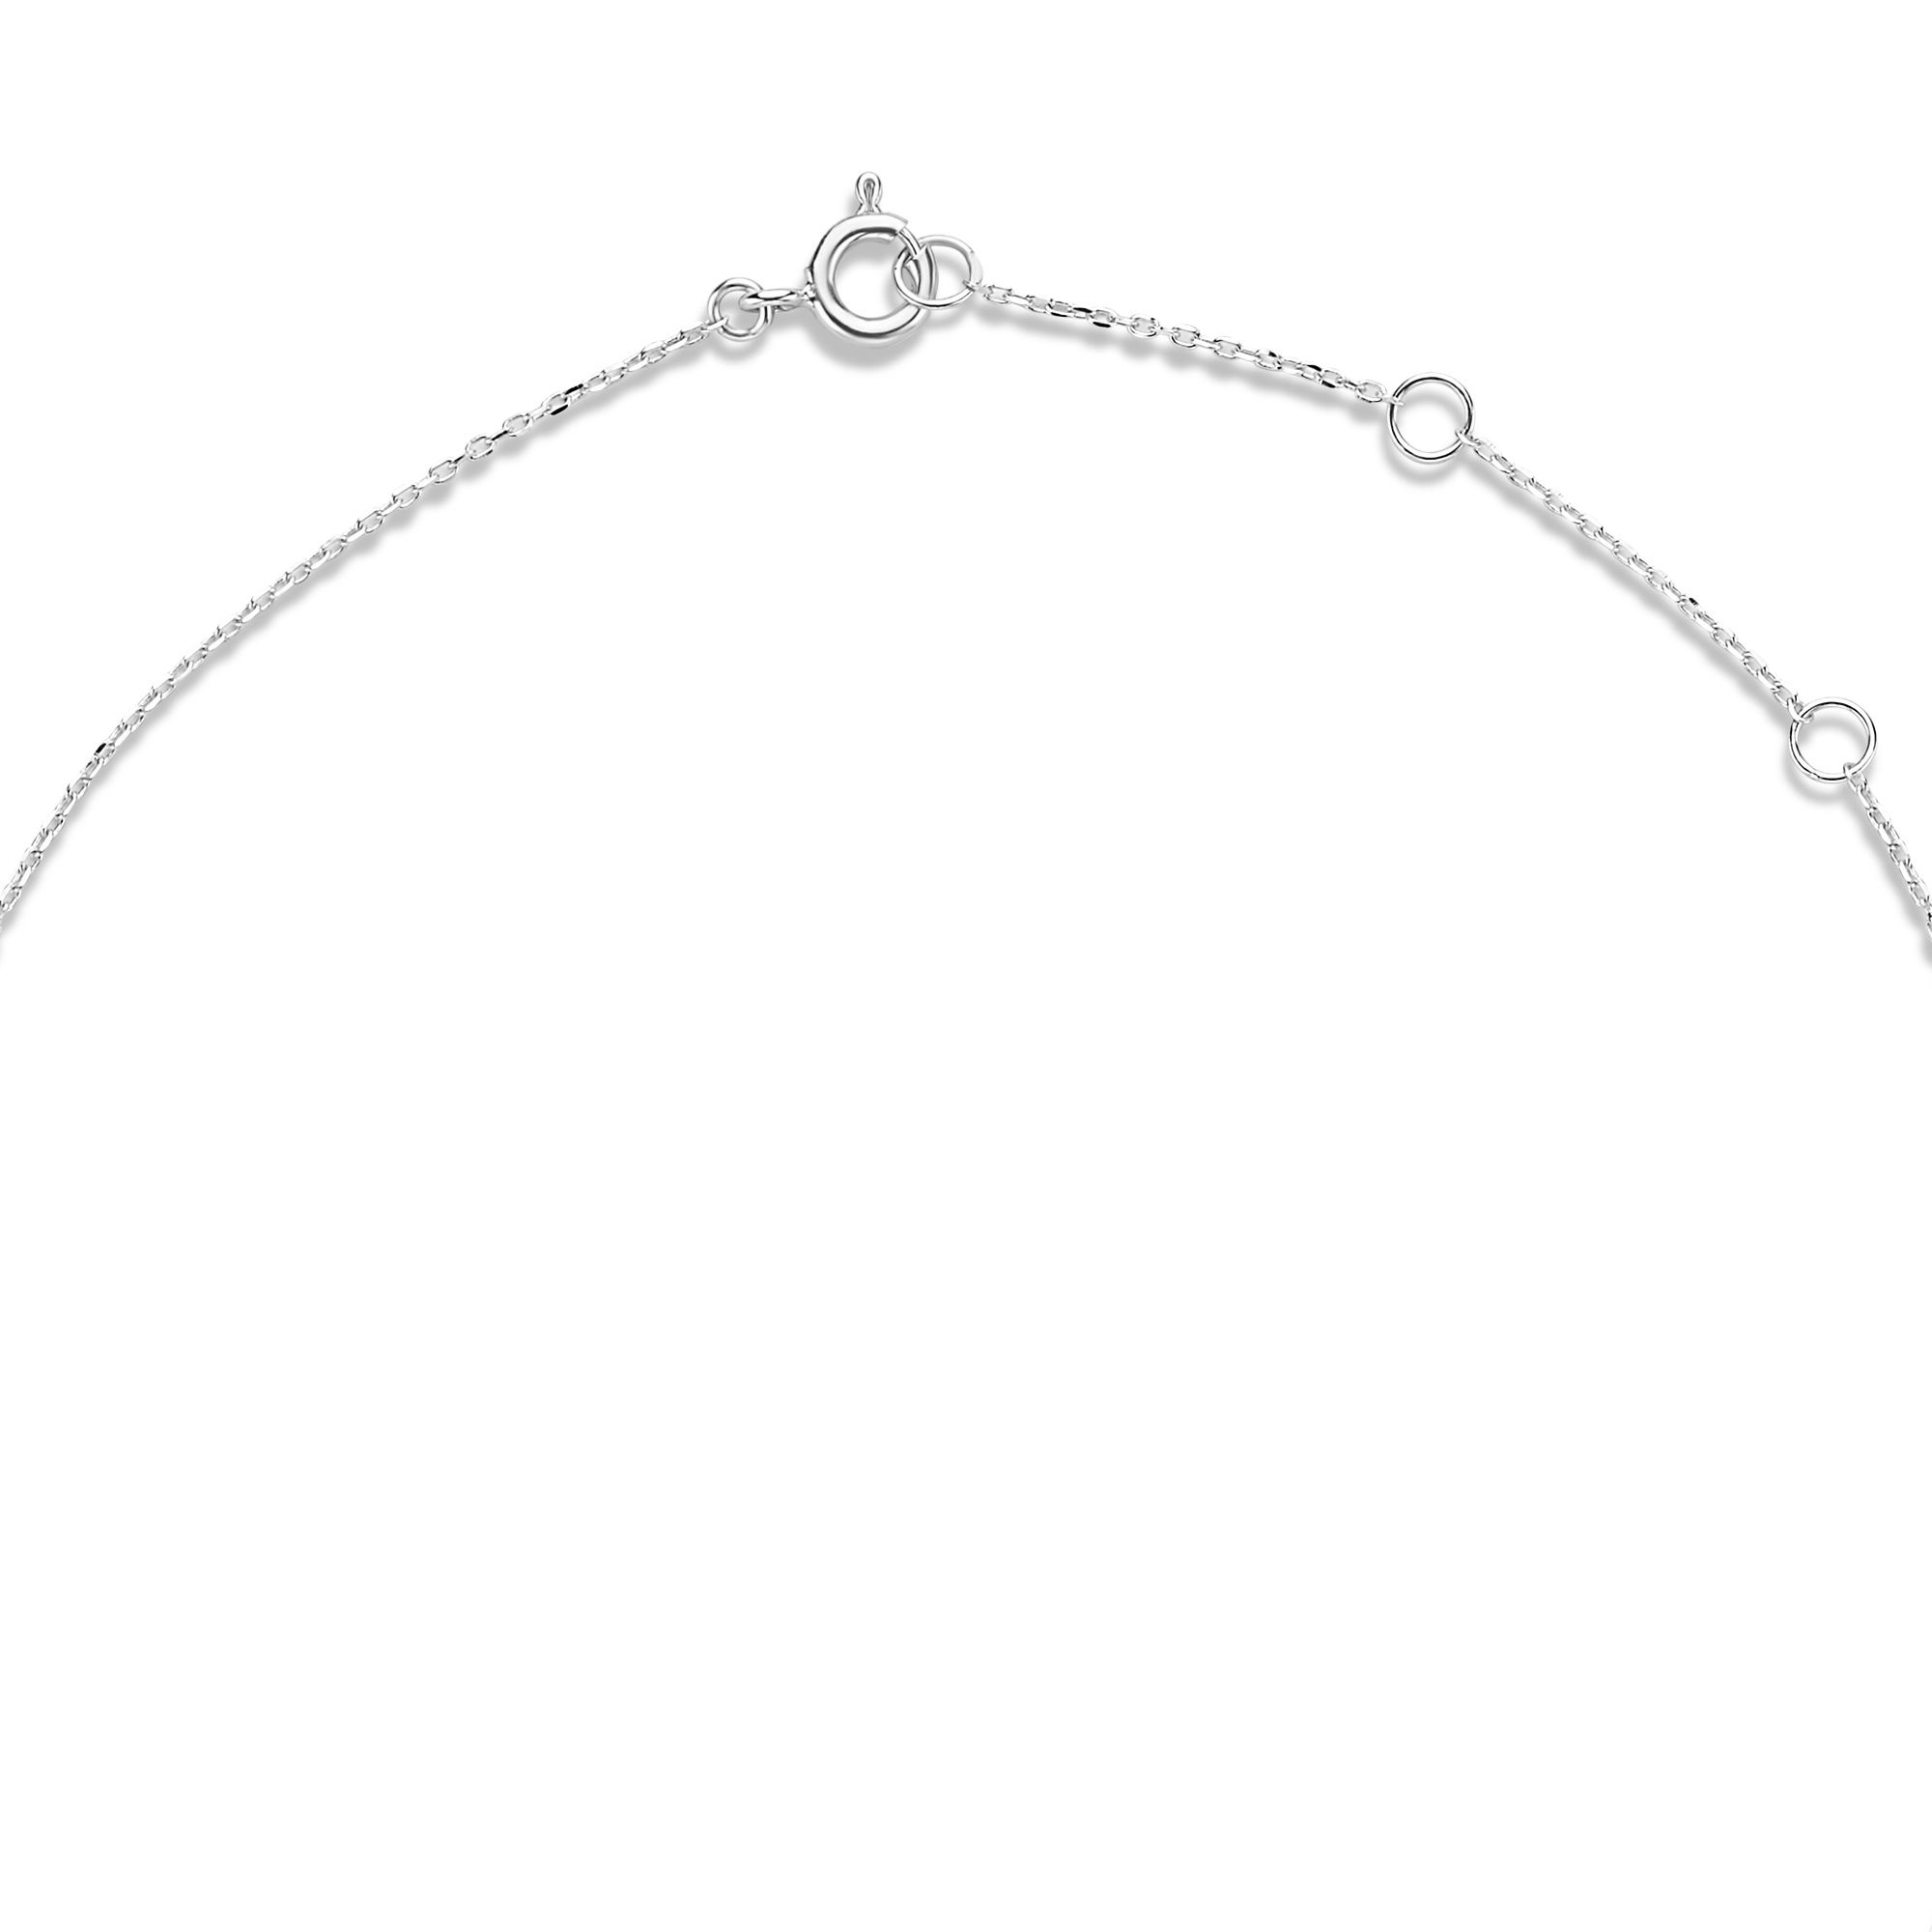 Isabel Bernard Saint Germain Loulou 14 karaat witgouden collier met ringetjes